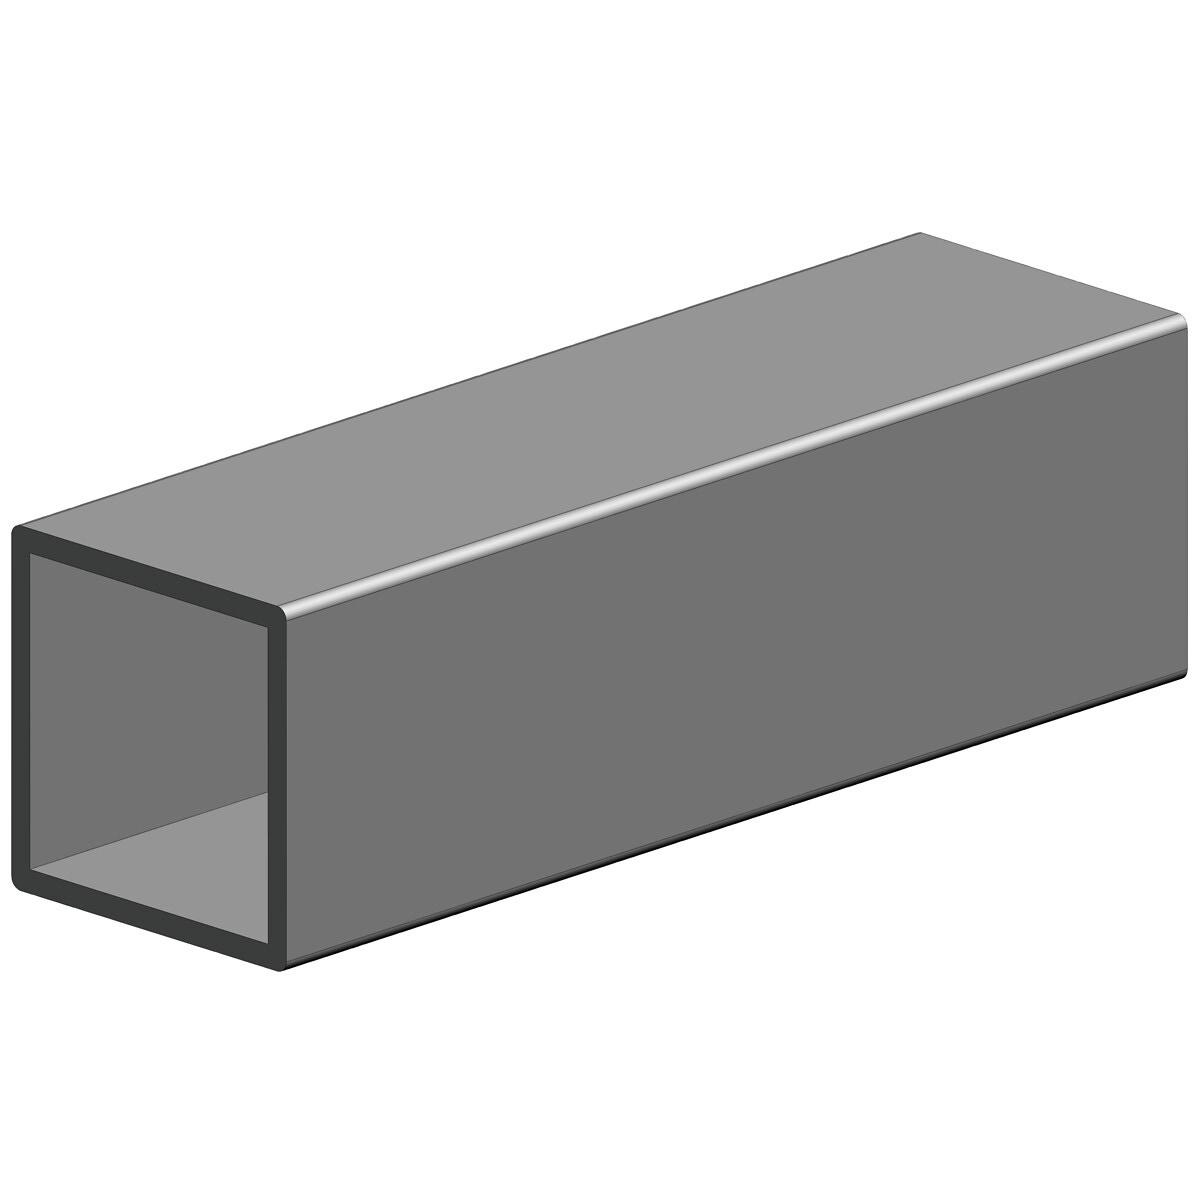 Alumiini neliöputki 30x30